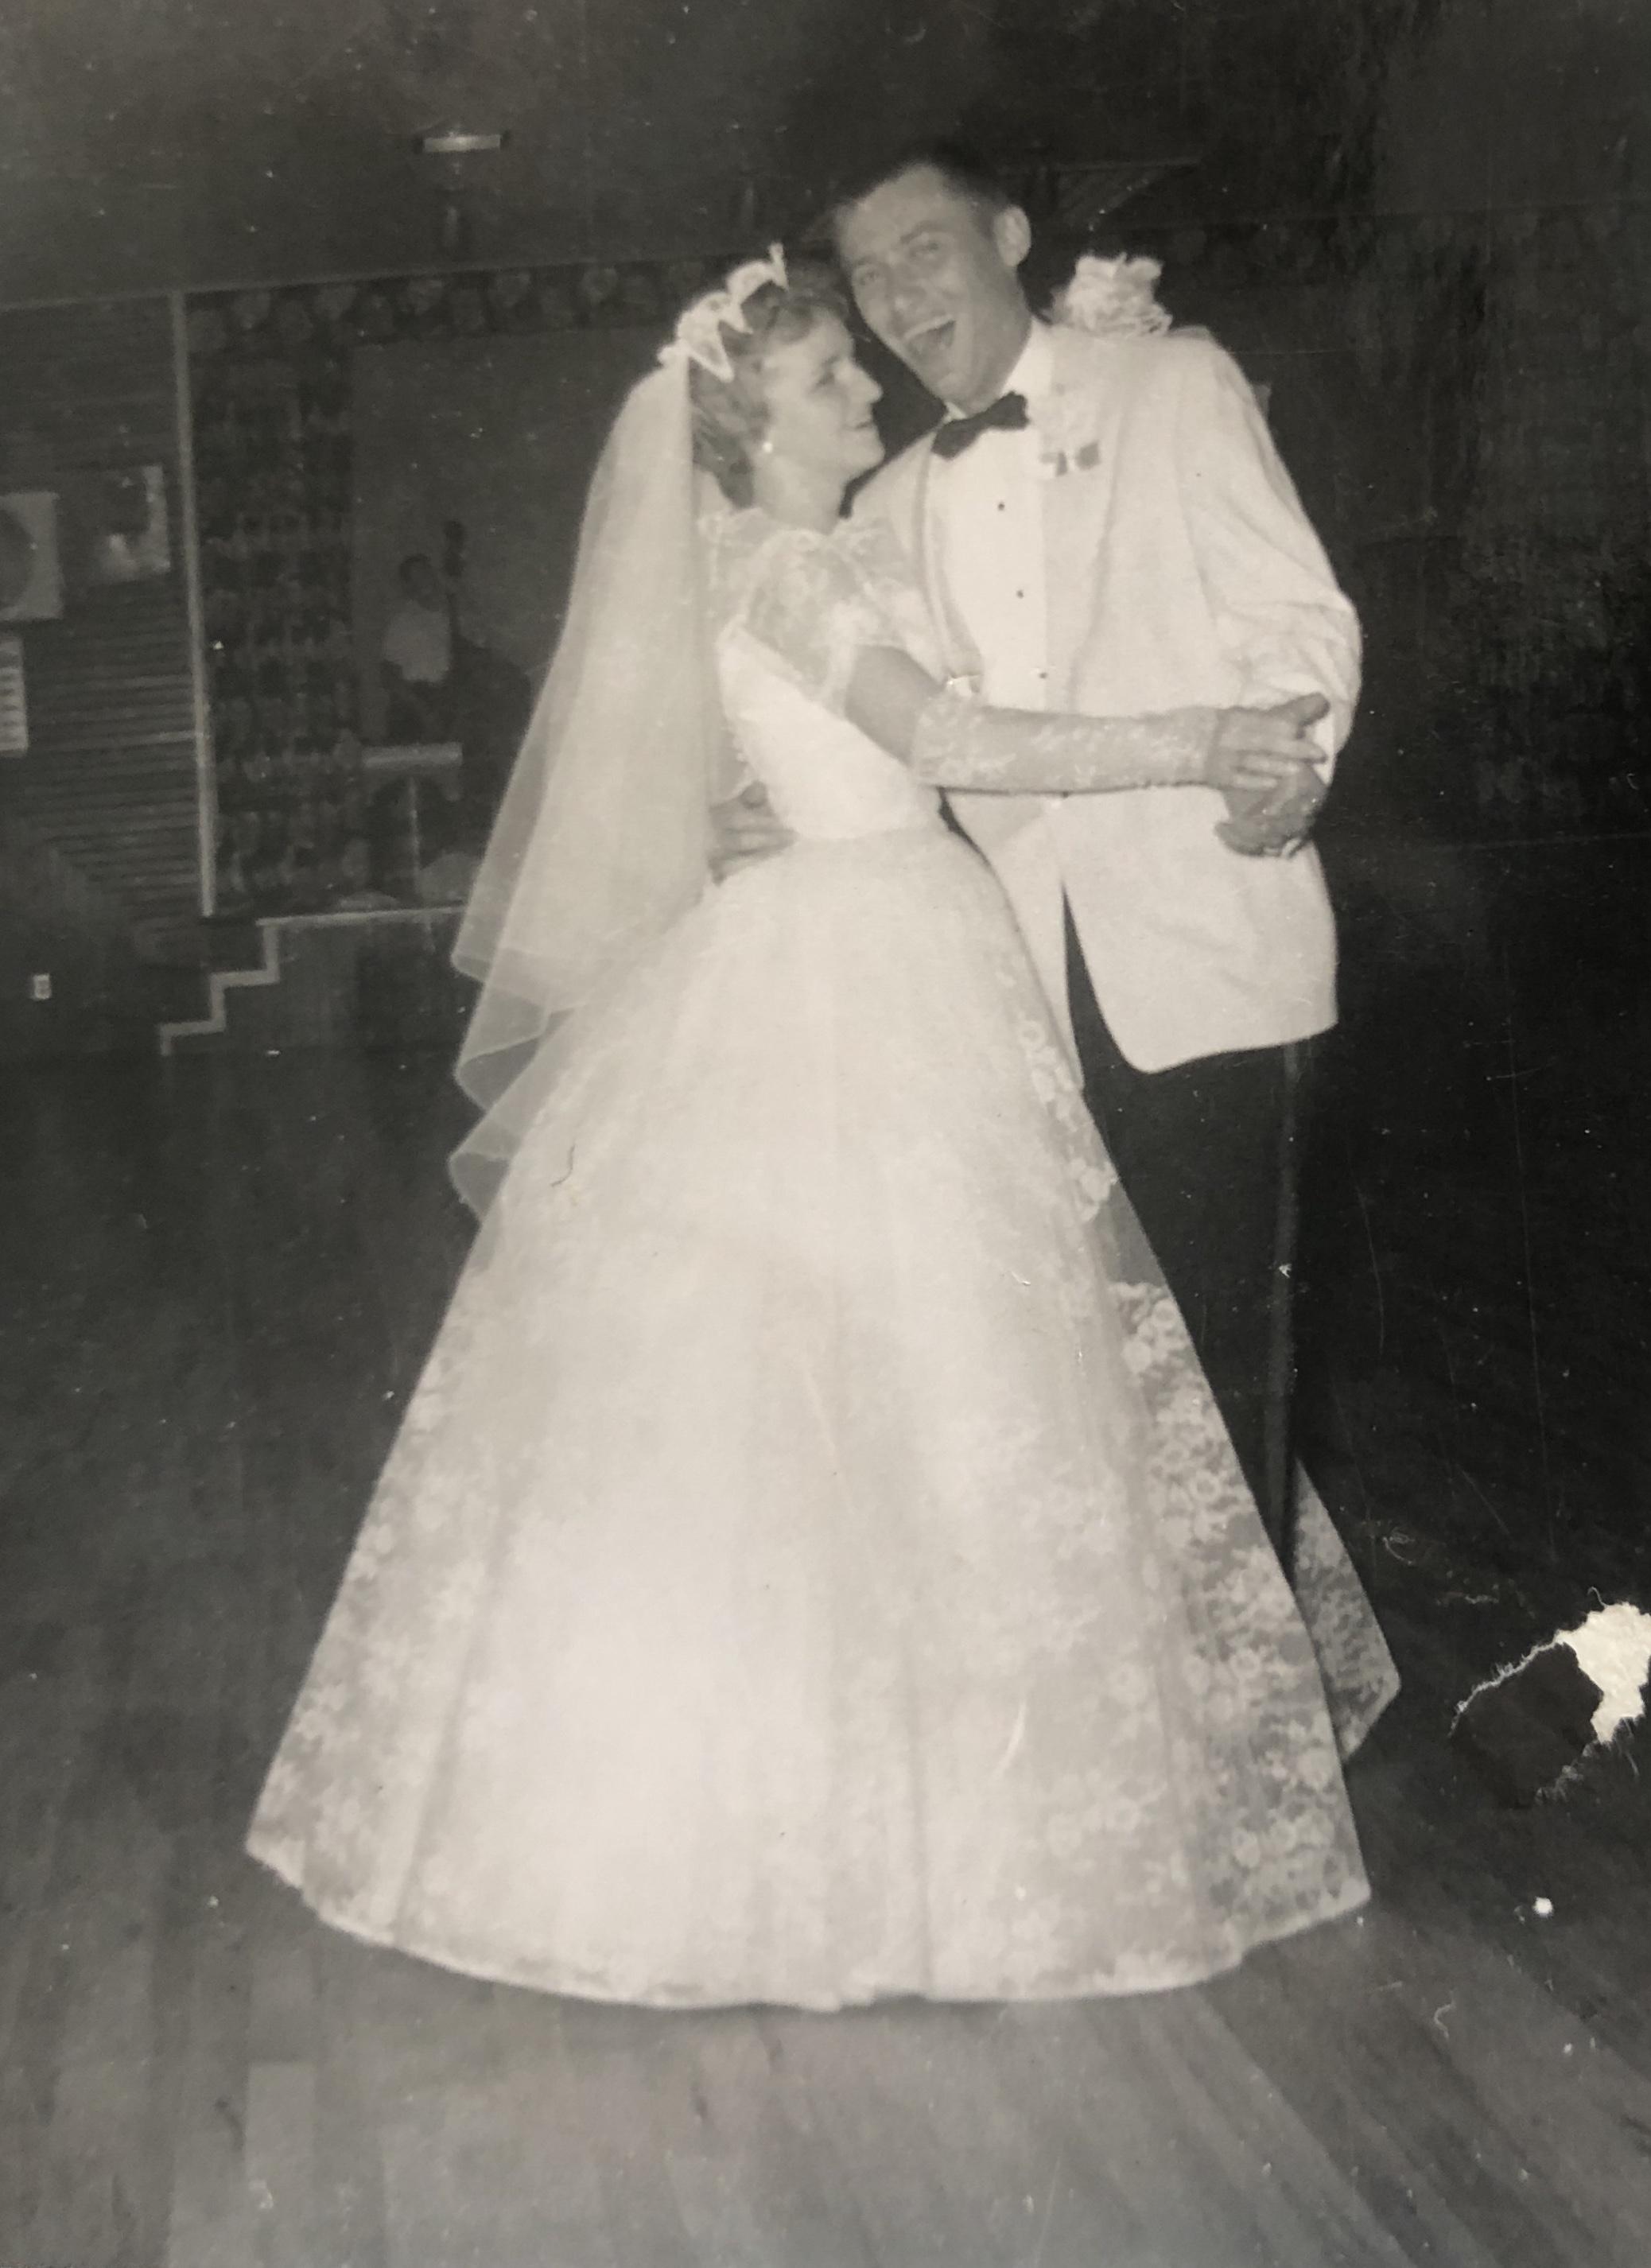 Hans and Darlene, 1959